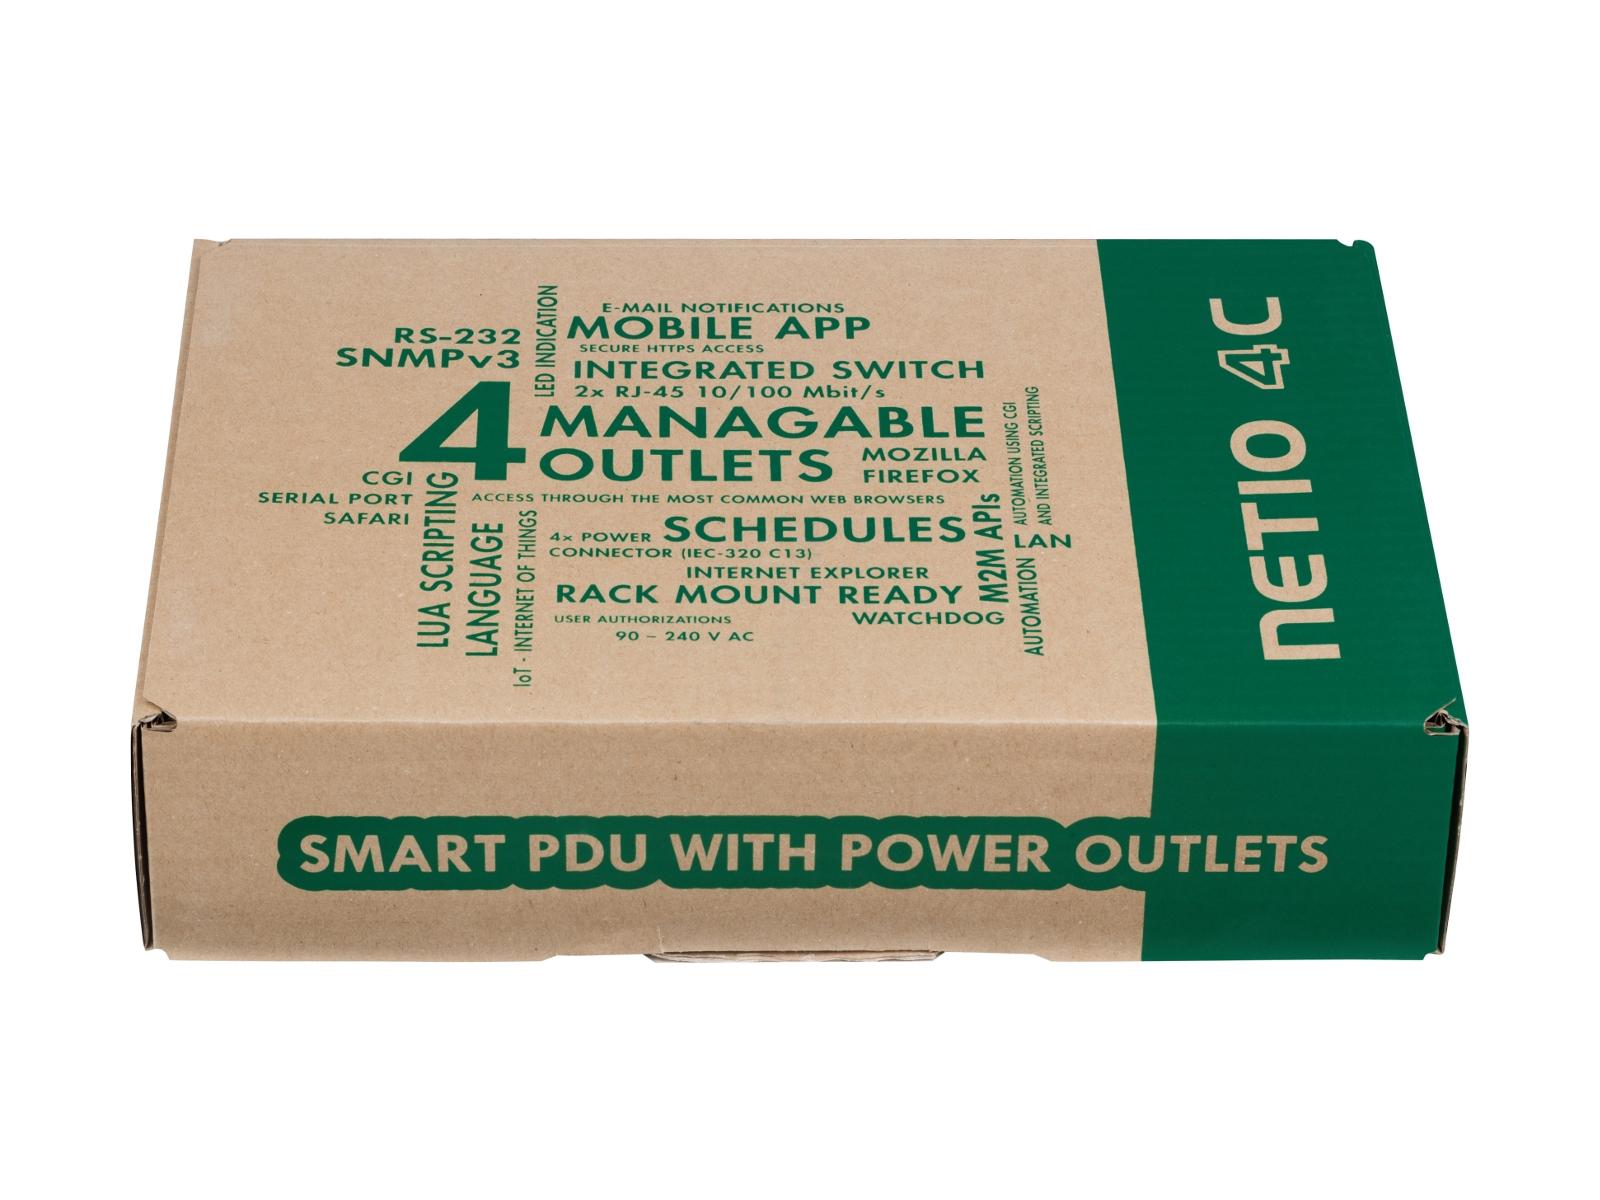 power outlet, smart PDU, PDU, Watchdog, watchdog functionality, server shutdown, ethernet switch, SNMP v3, snmpv3, snmp pdu, Telnet, Scheduler